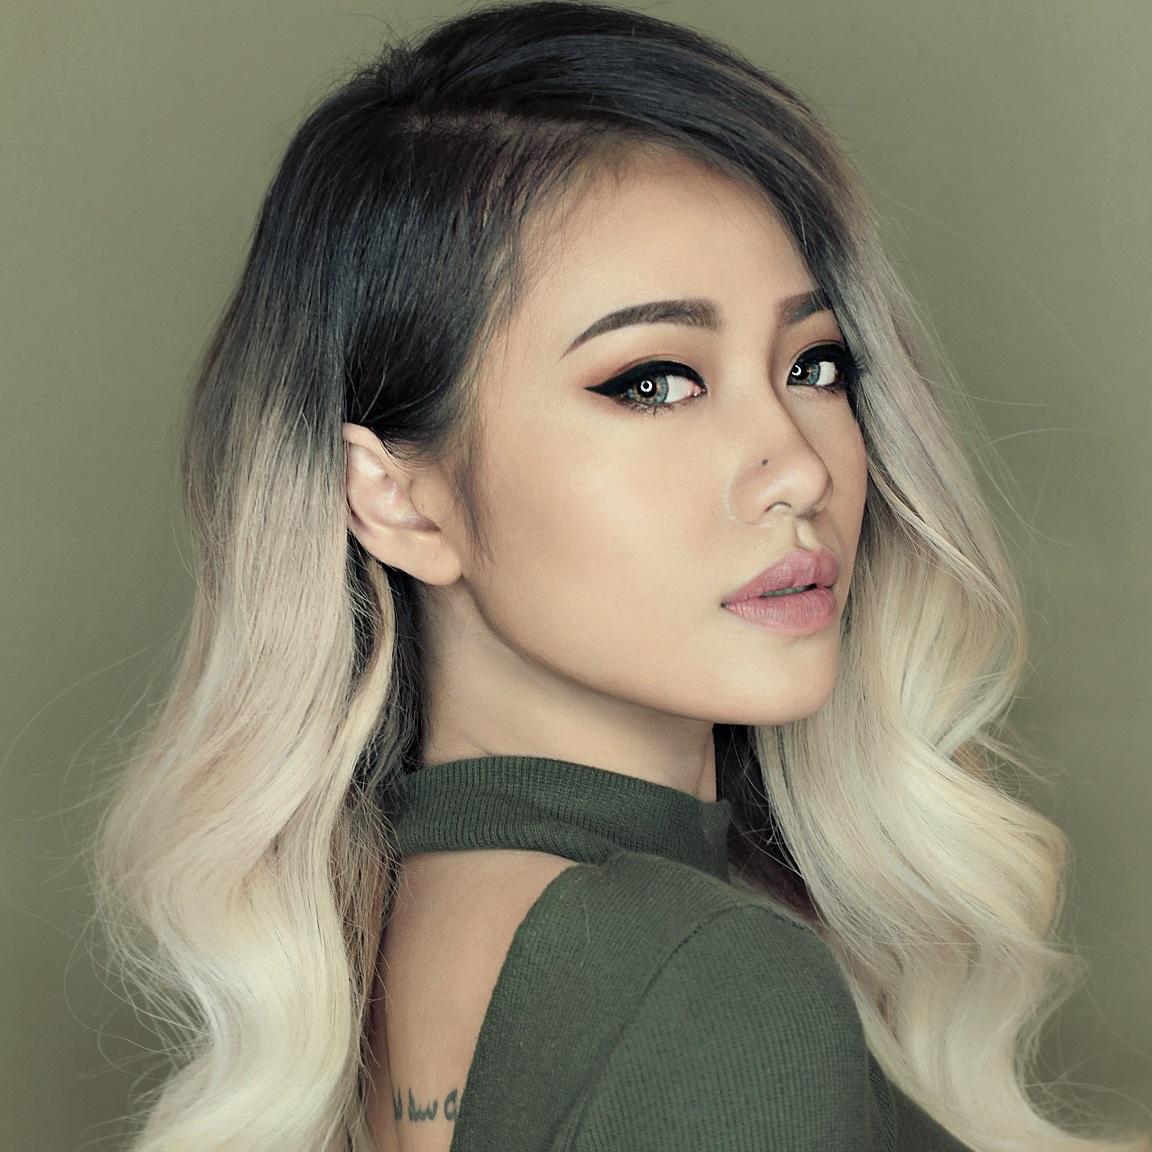 chuong reng reng